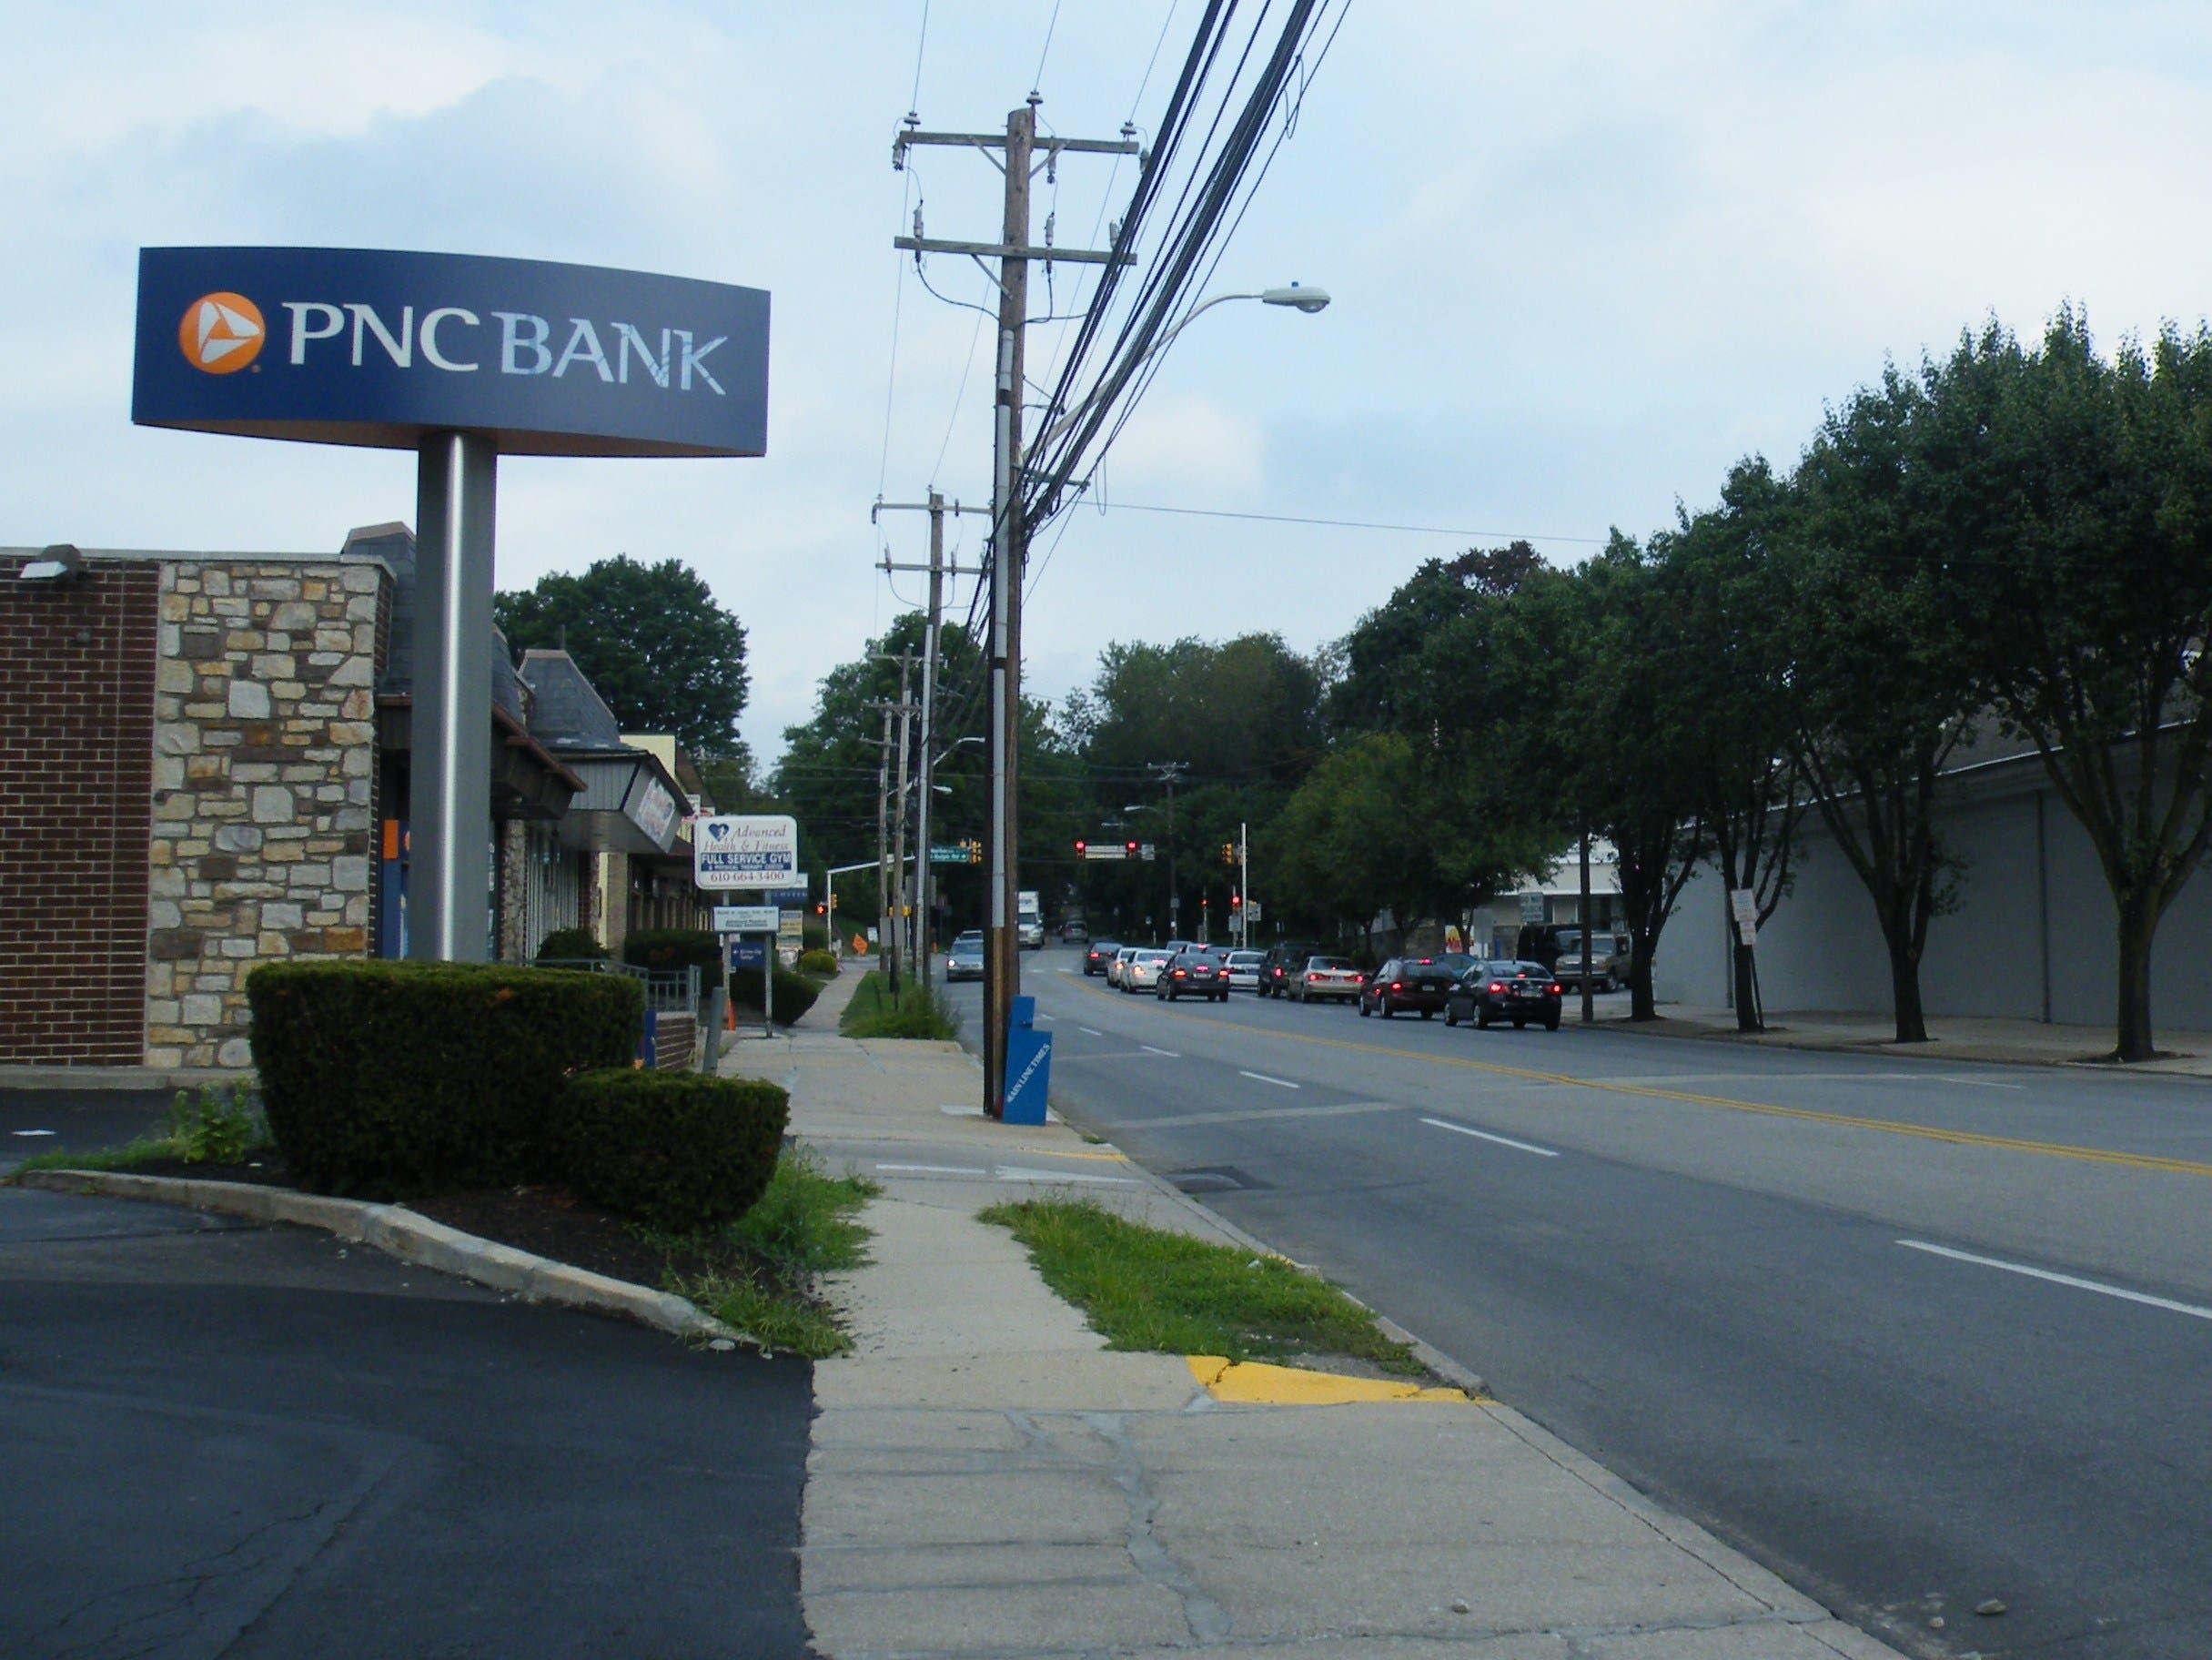 Pnc Locations